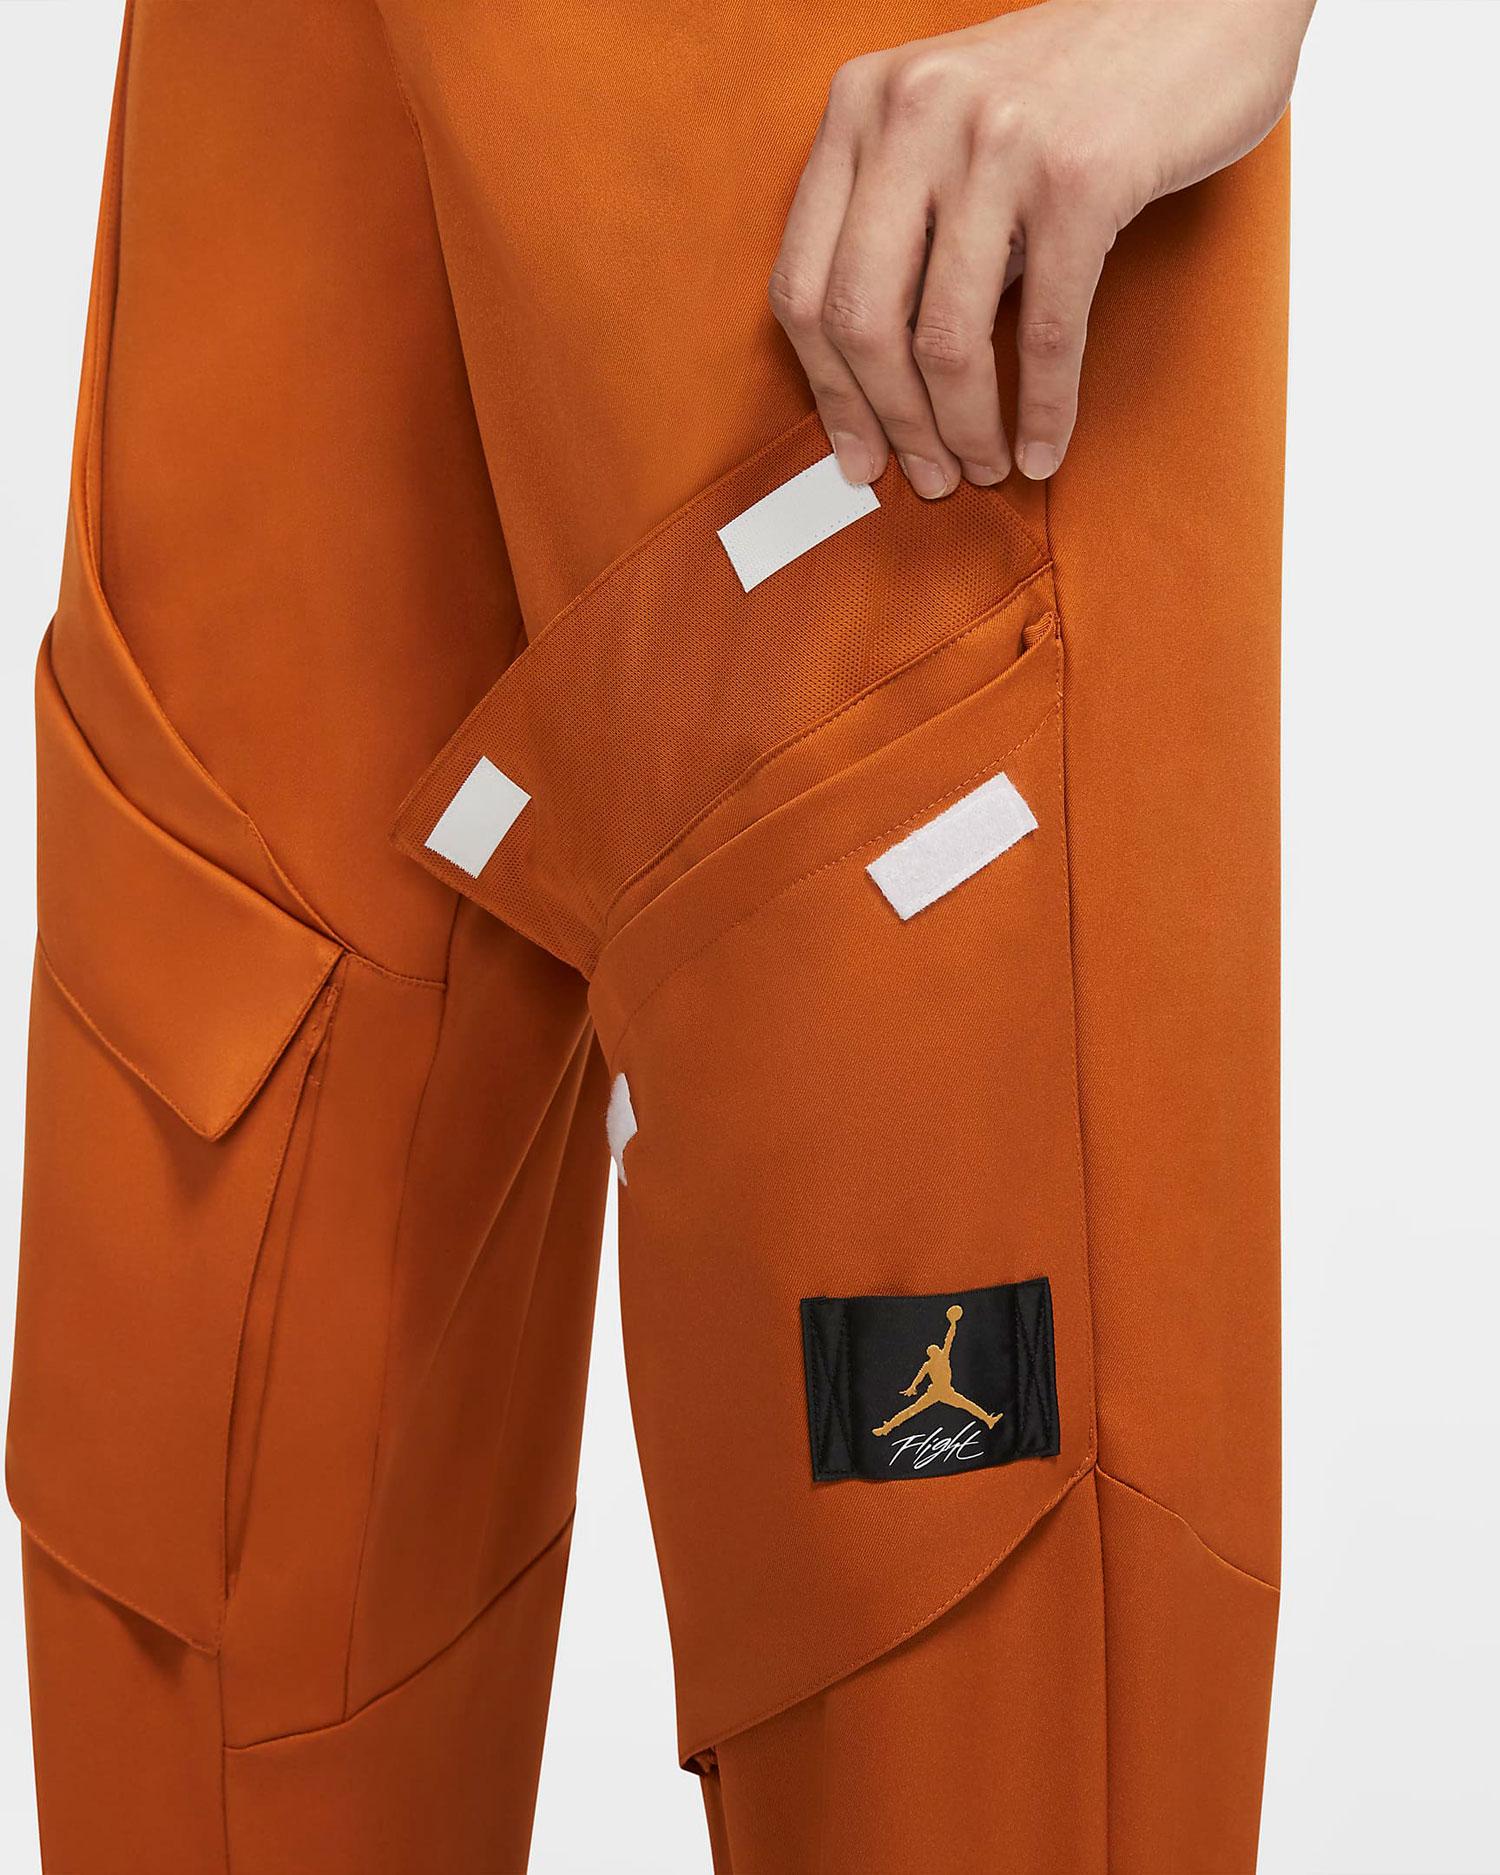 jordan-4-womens-starfish-pants